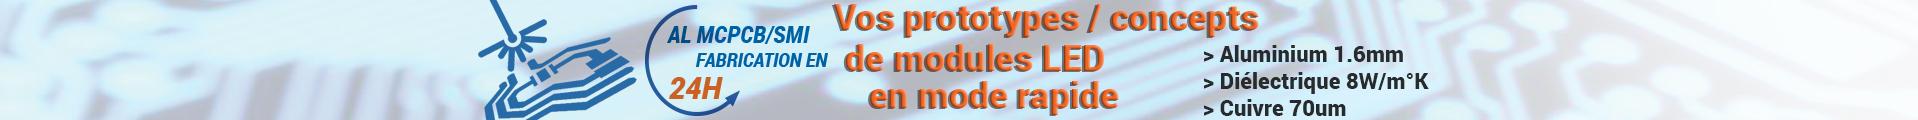 slider-principal-meodex2-V0